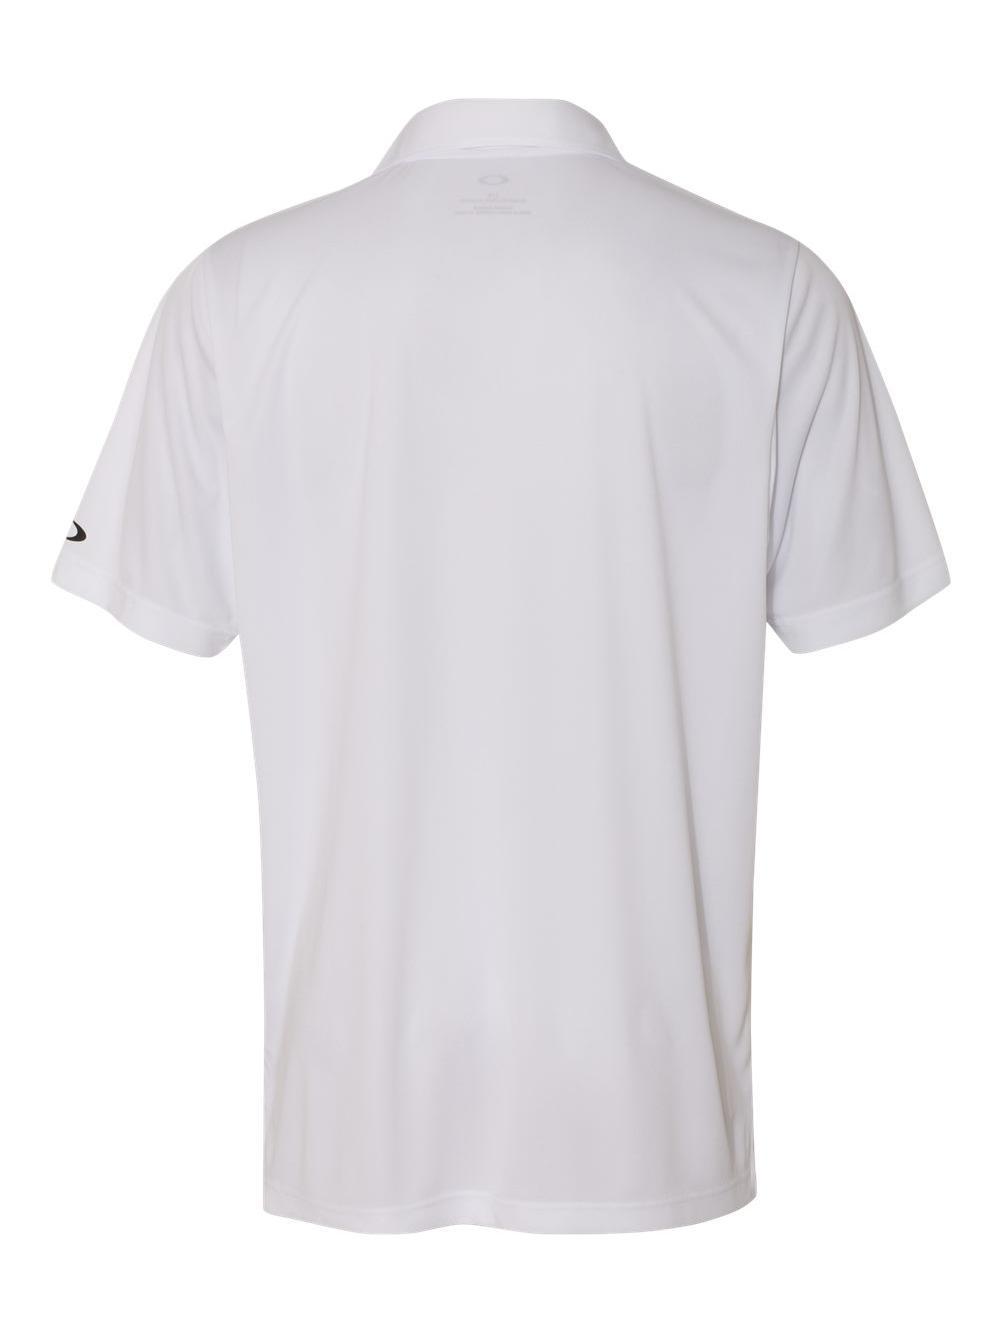 Oakley-Performance-Sport-Shirt-433979ODM thumbnail 19